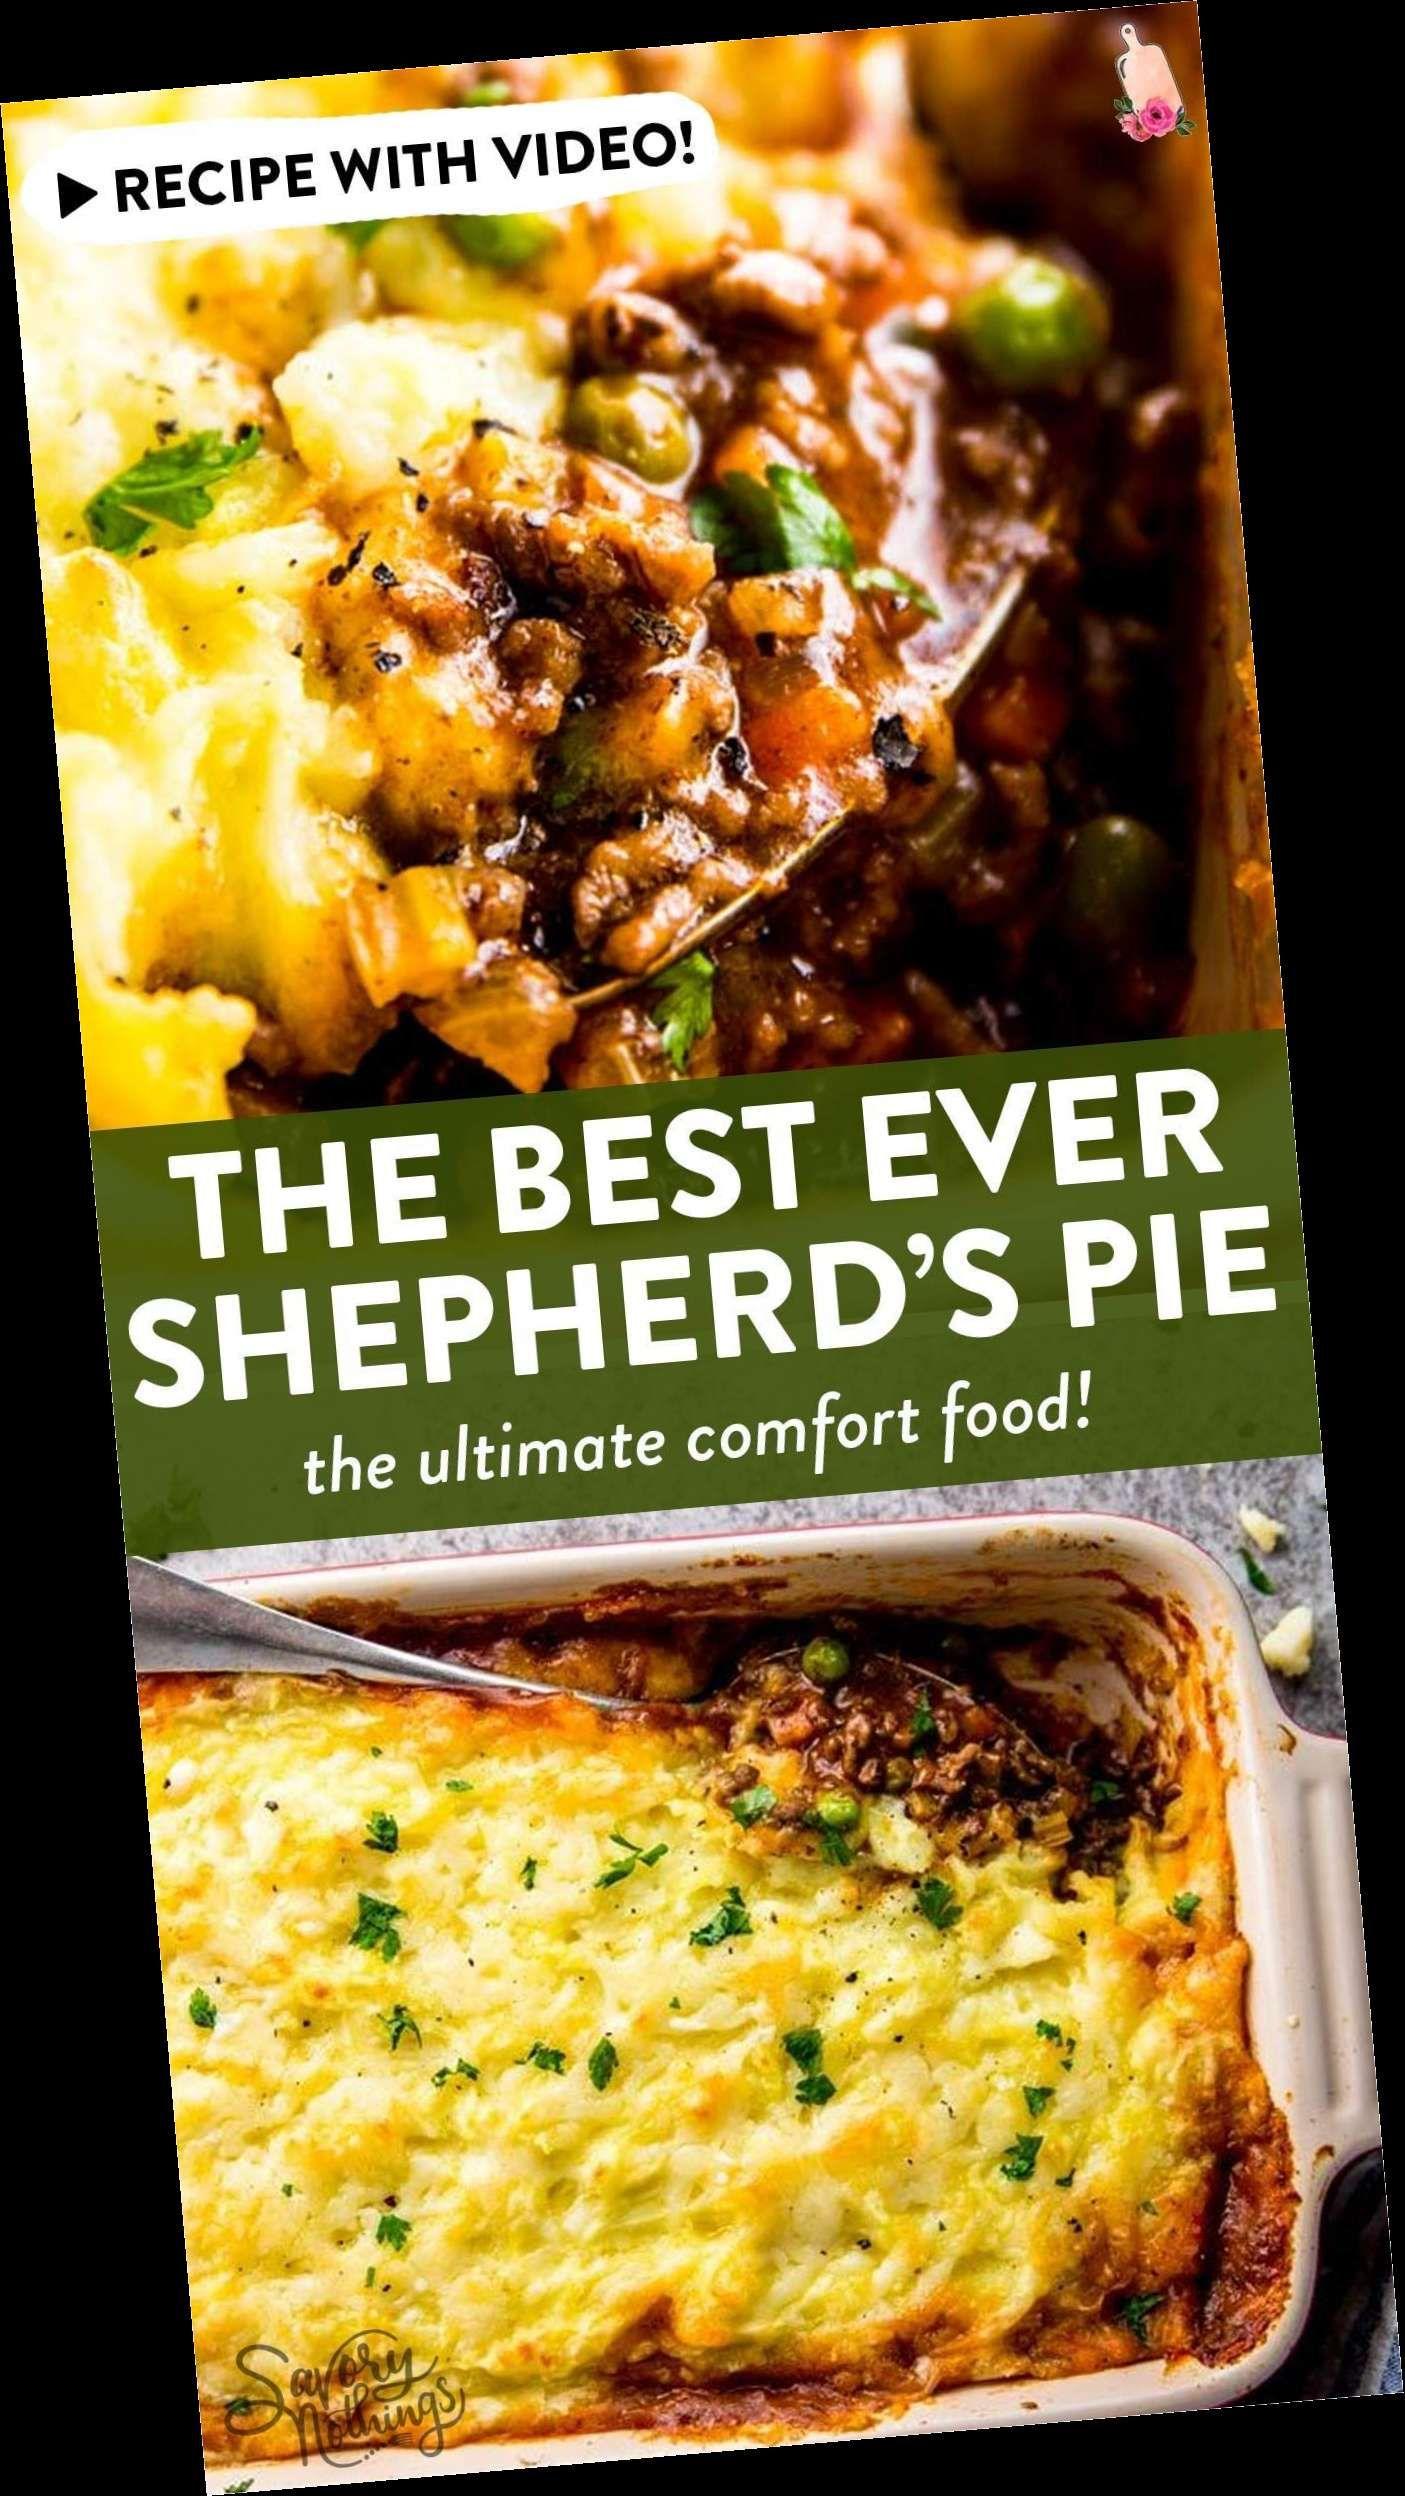 +19 Shepherds Pie Recipe The Best Homemade Shepherd's Pie Recipe